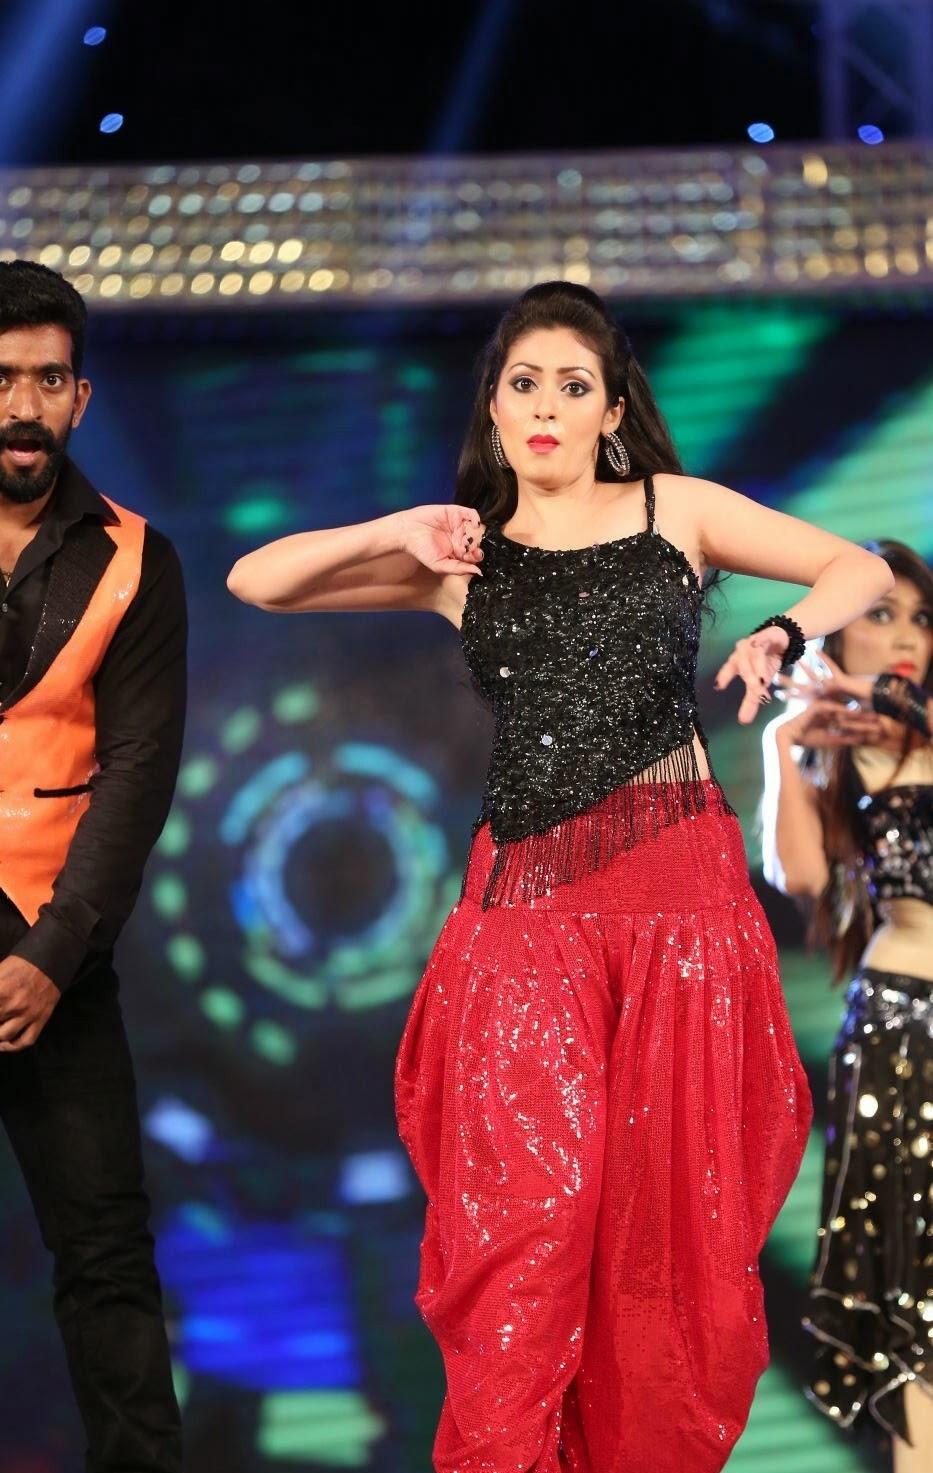 Sada Hot Dance Performance at Gama Awards | HQ Pics n ...